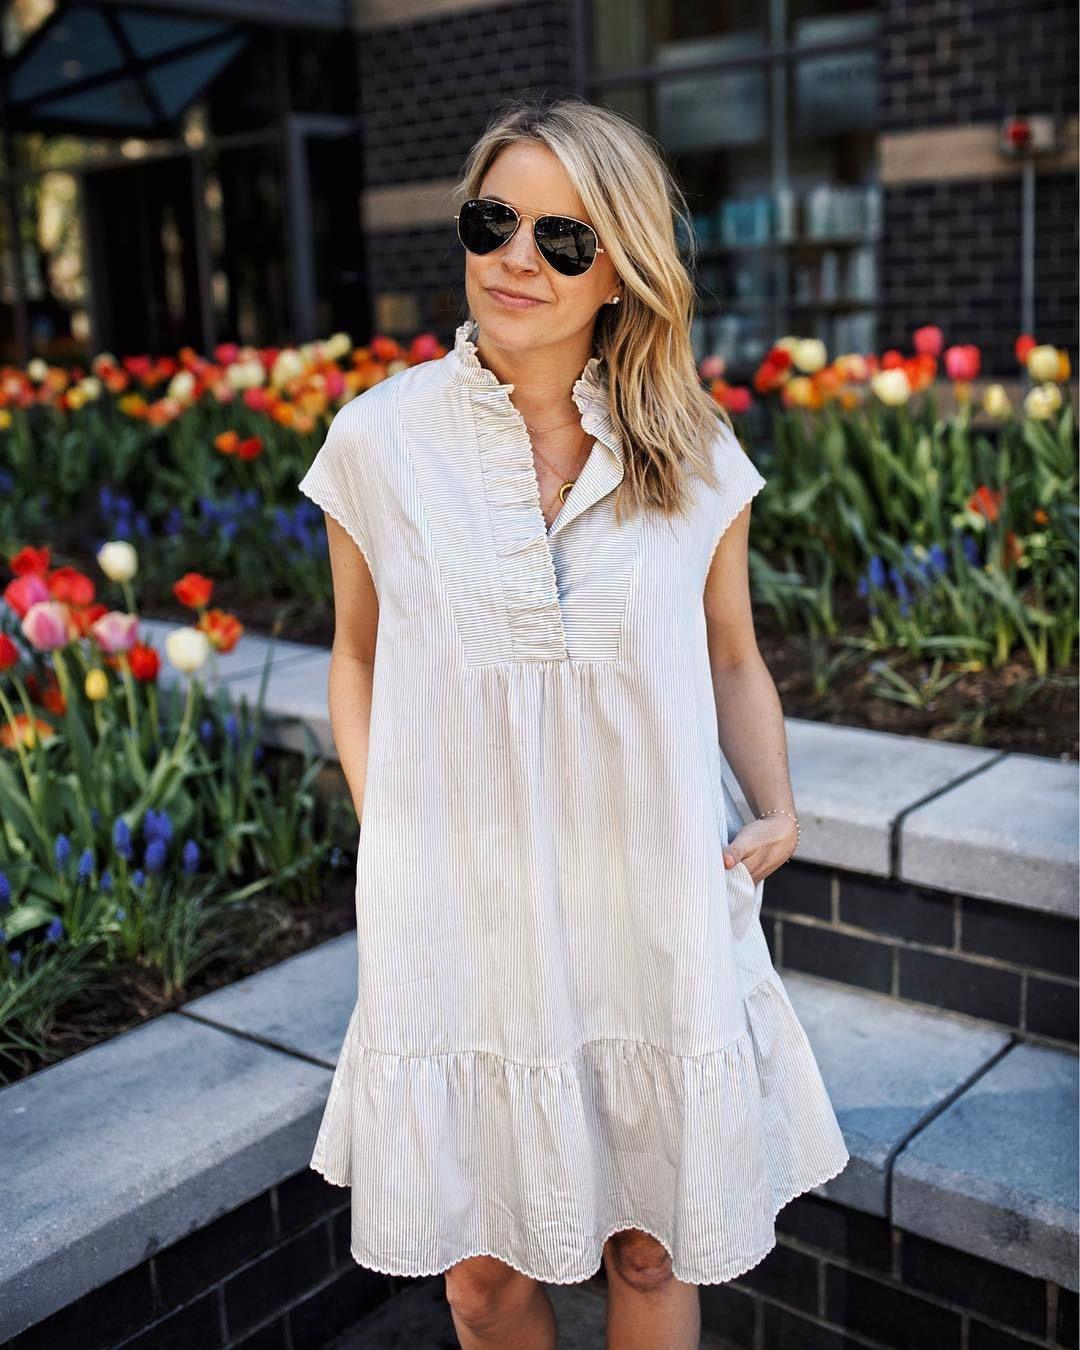 Get the dress for $69 at stories.com – Wheretoget